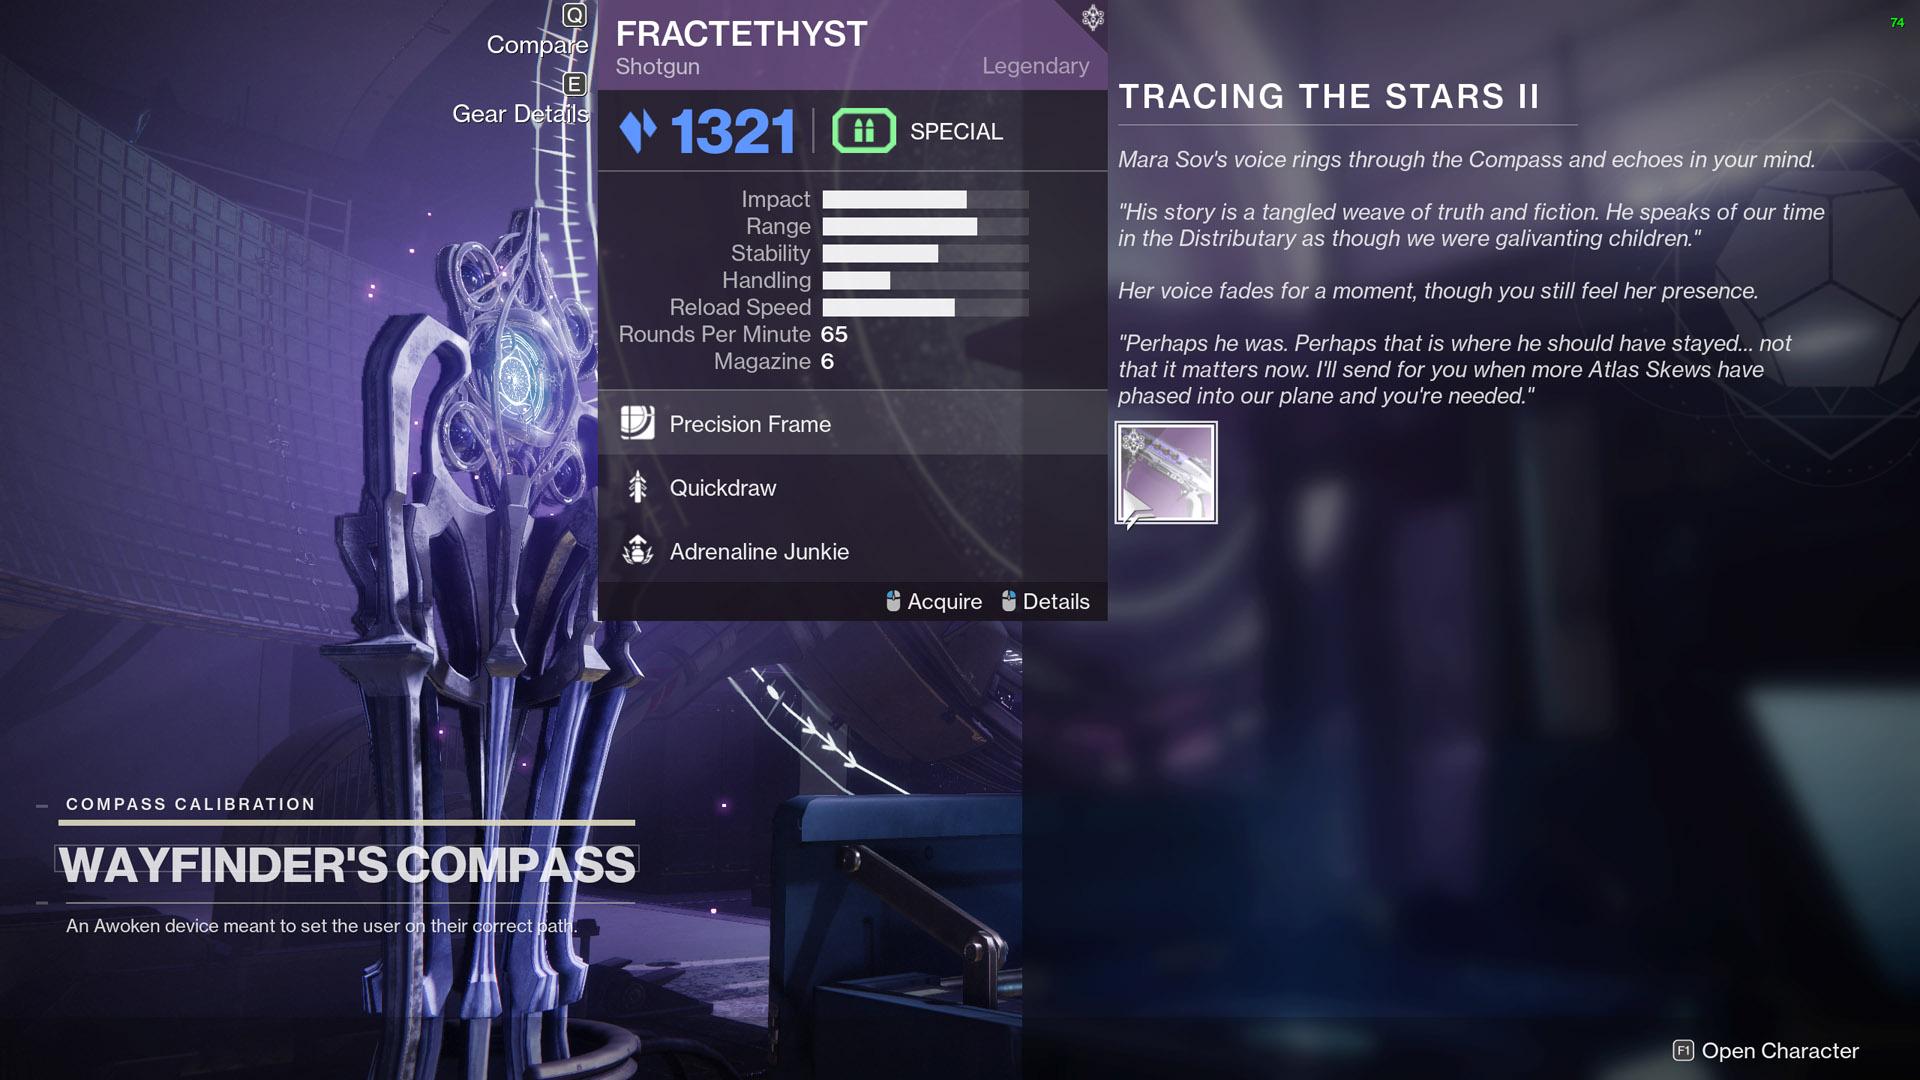 destiny 2 tracing the stars part II